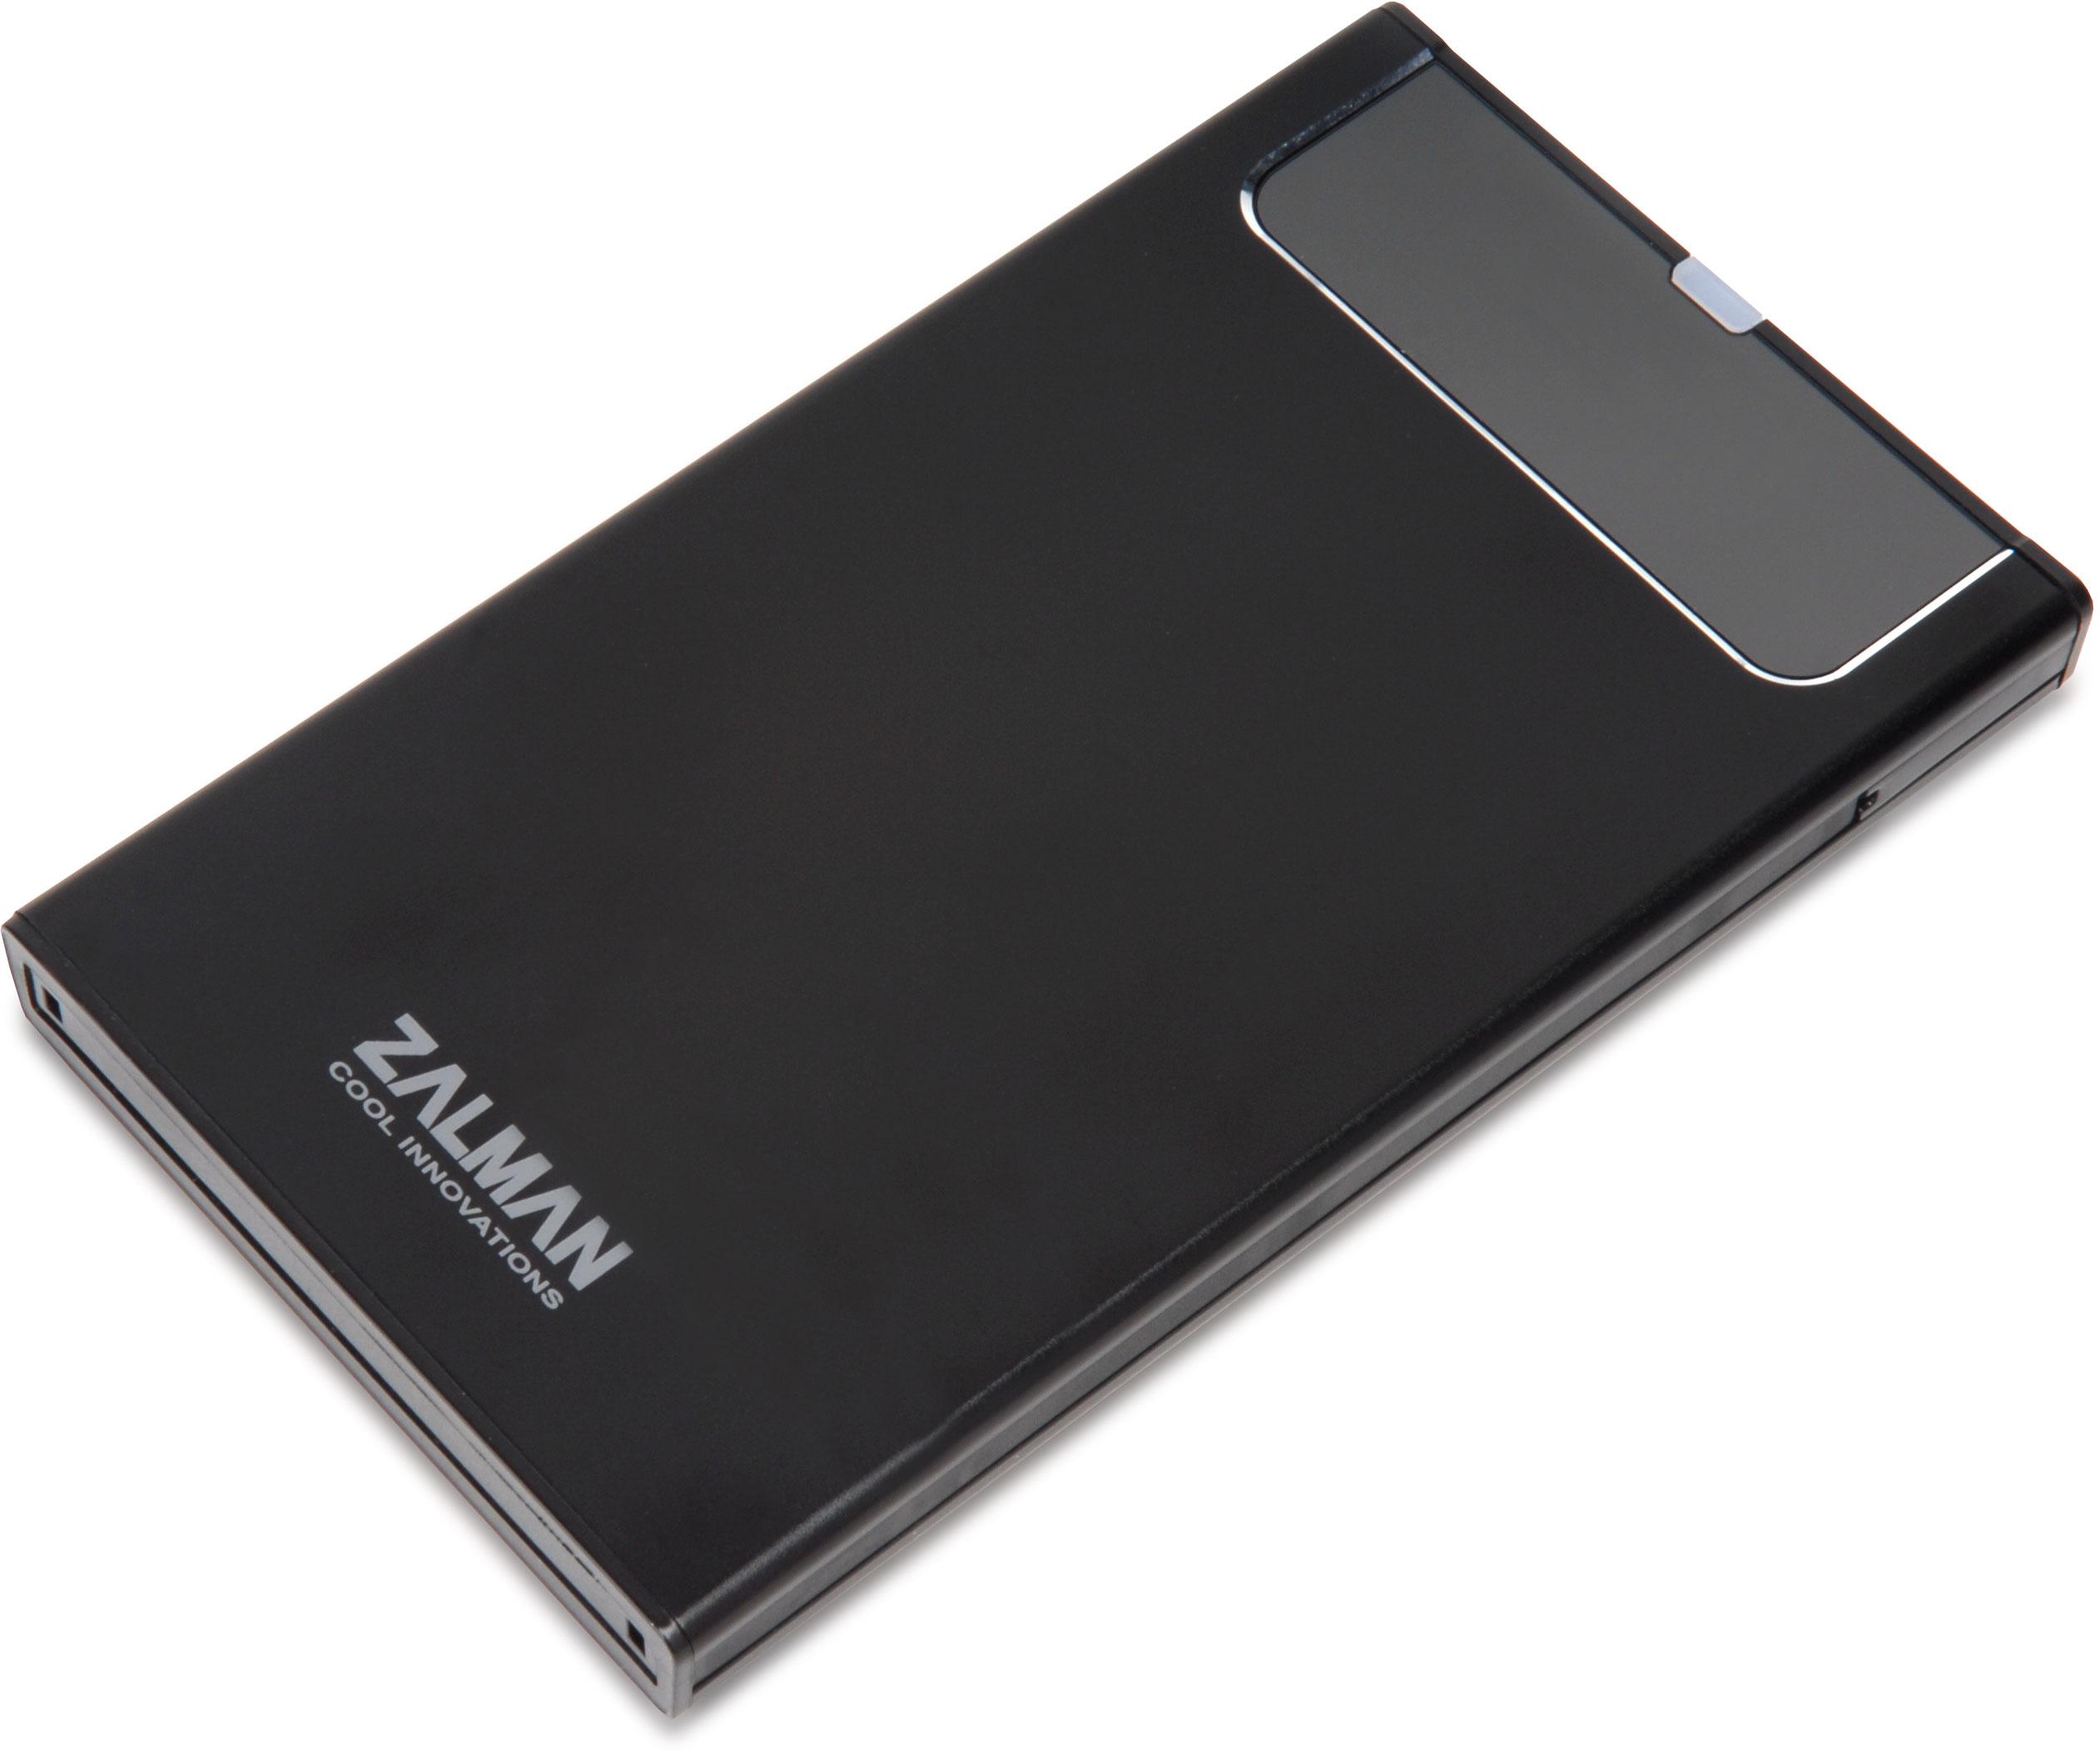 Zalman ZM-HE130 External HDD Drivers for Mac